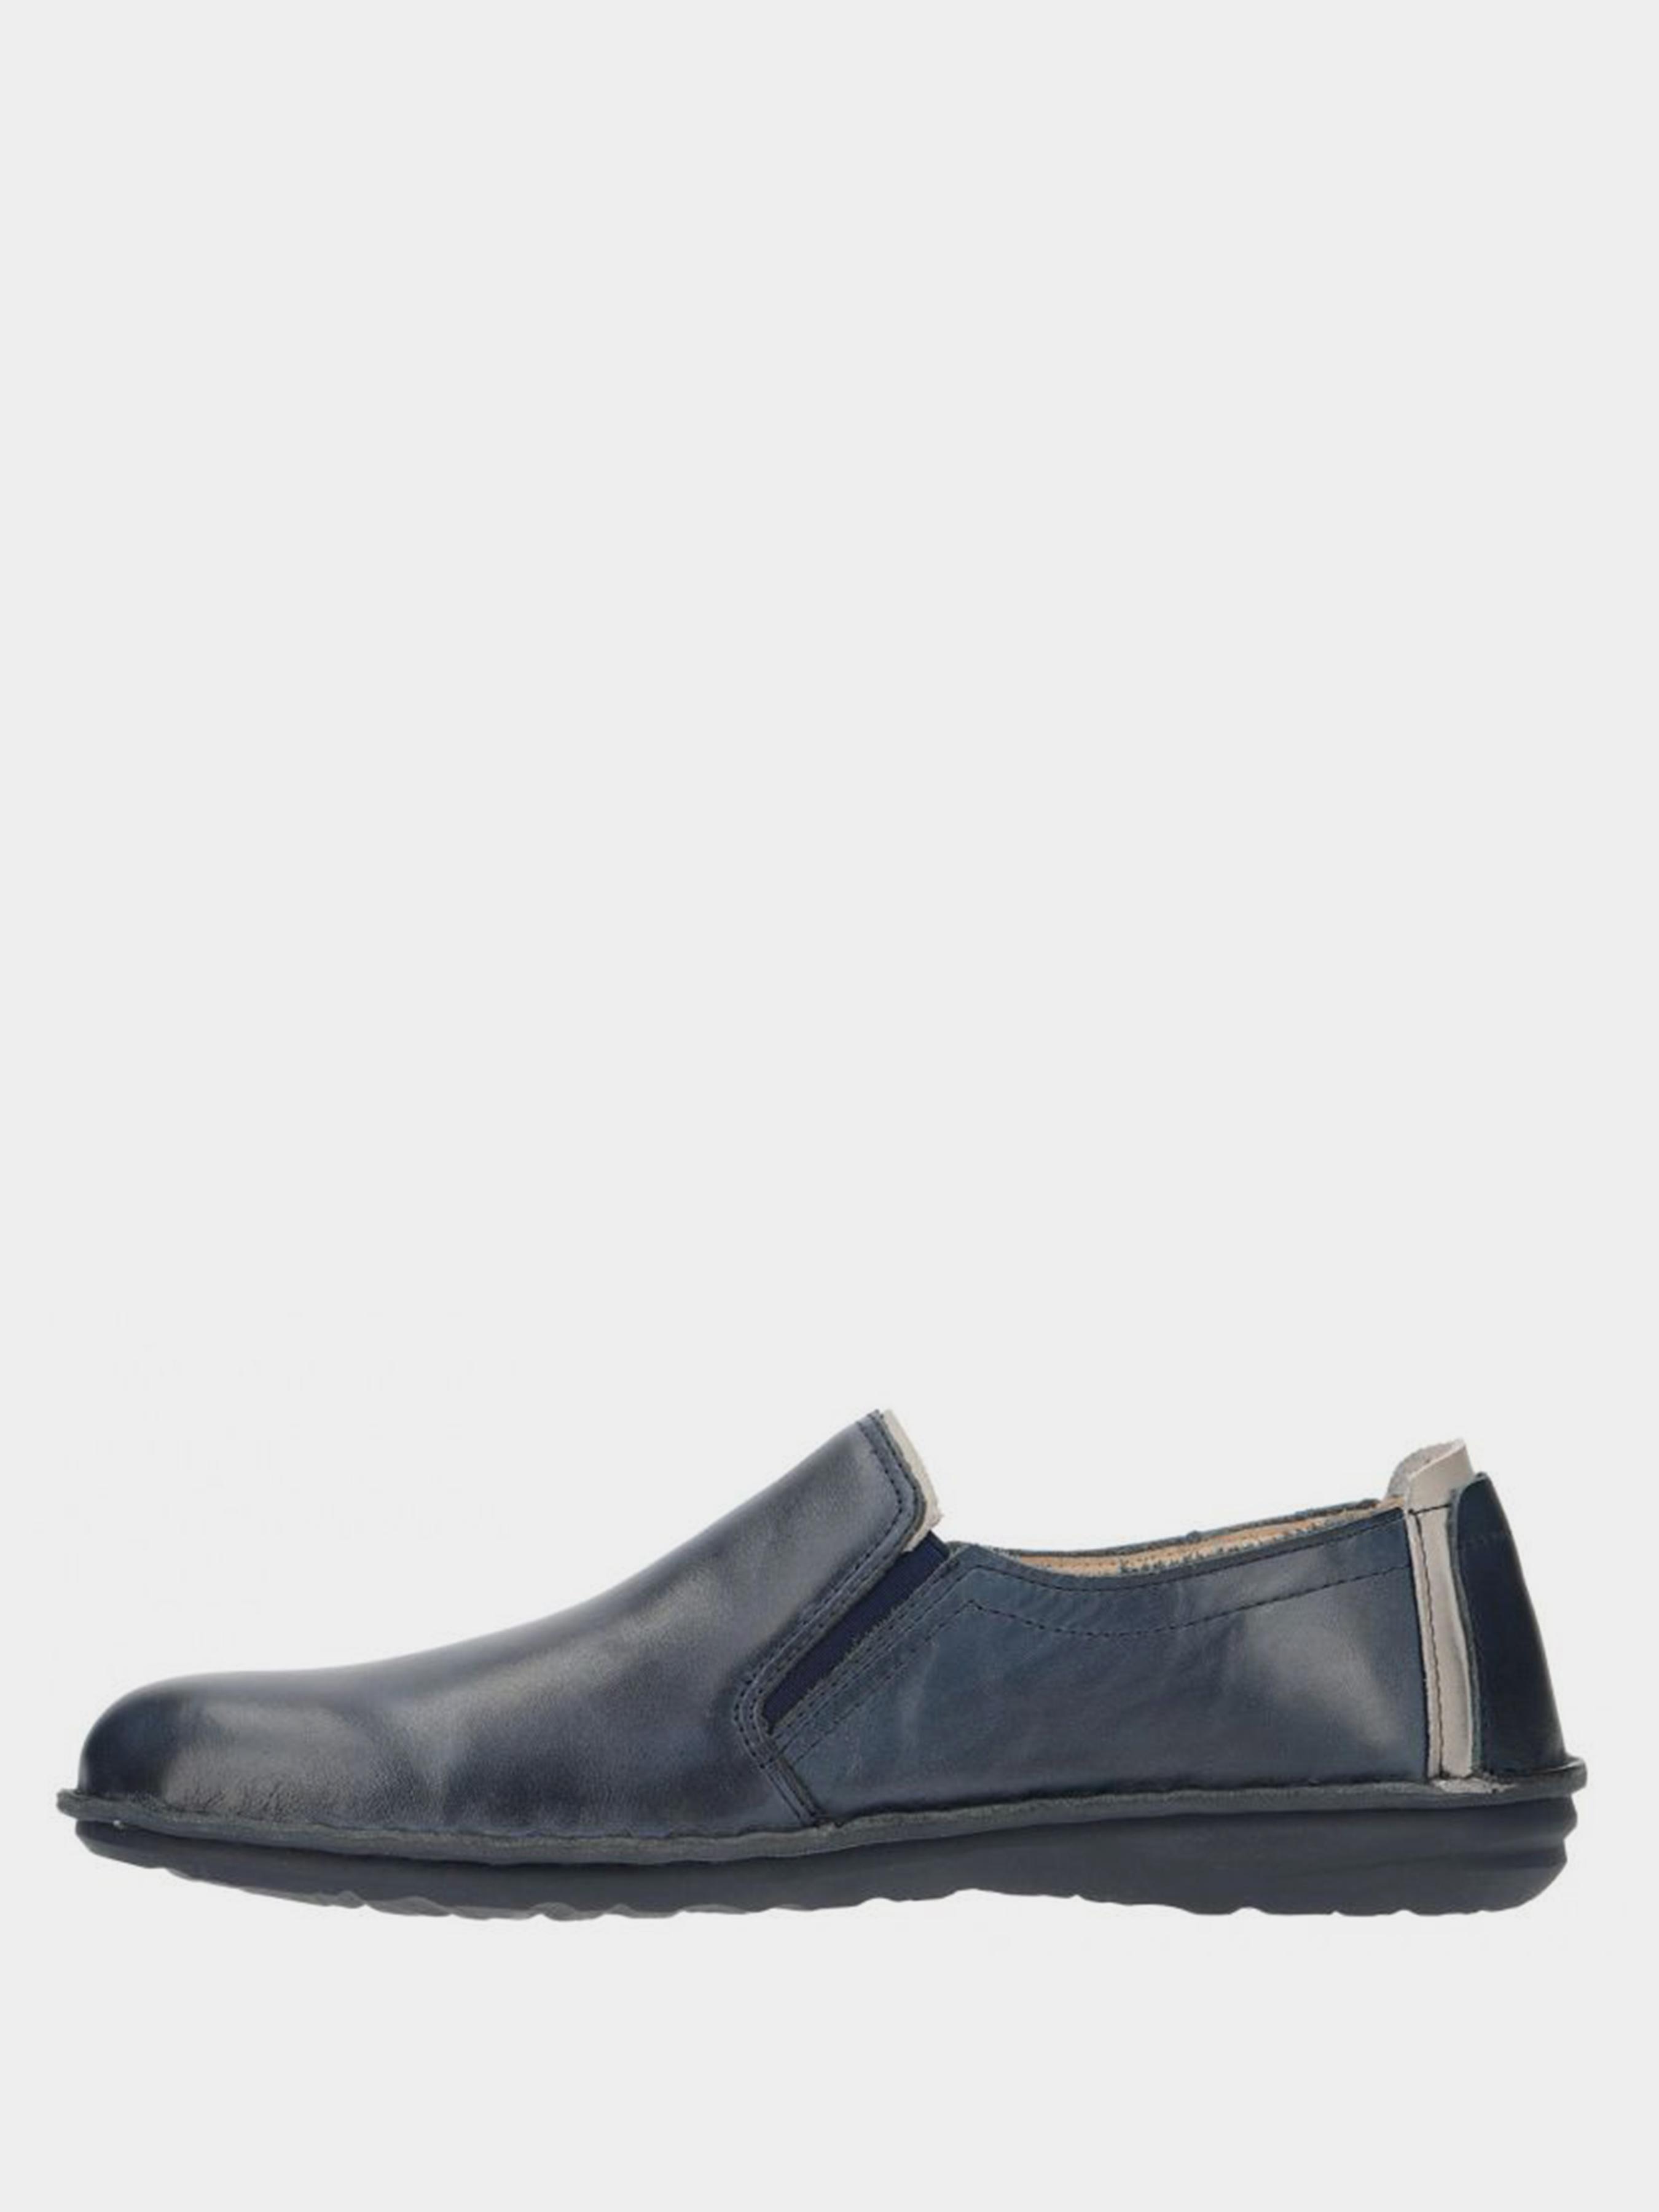 Полуботинки для мужчин PIKOLINOS SH293 брендовая обувь, 2017